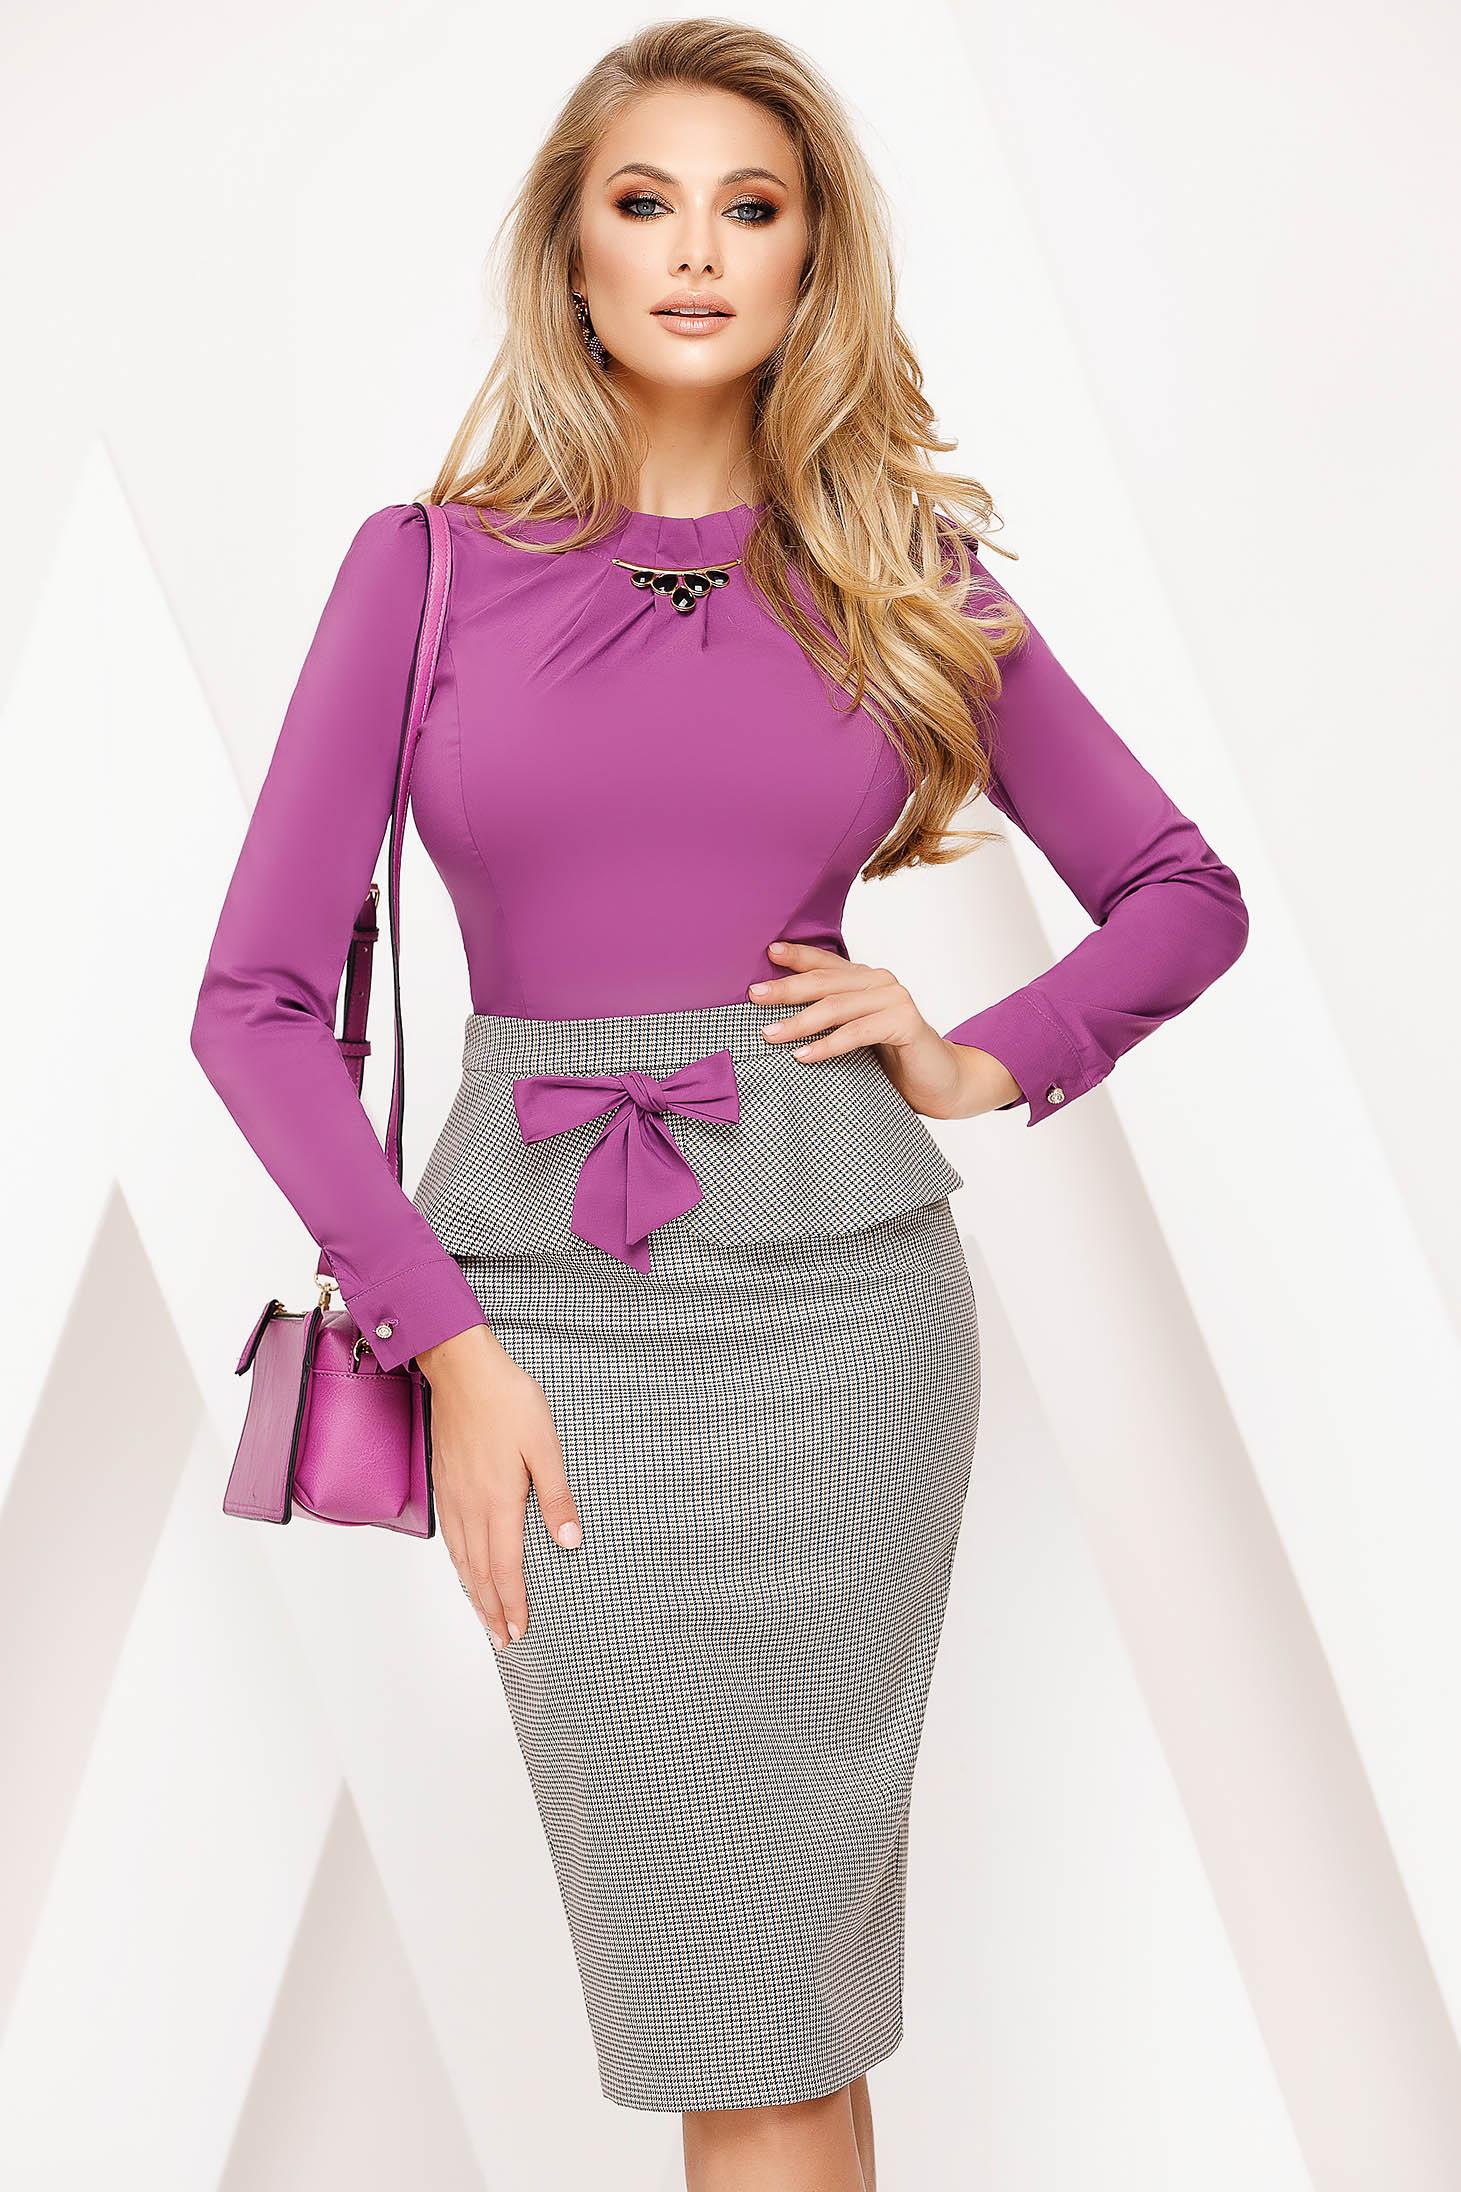 Skirt purple office midi pencil cloth thin fabric